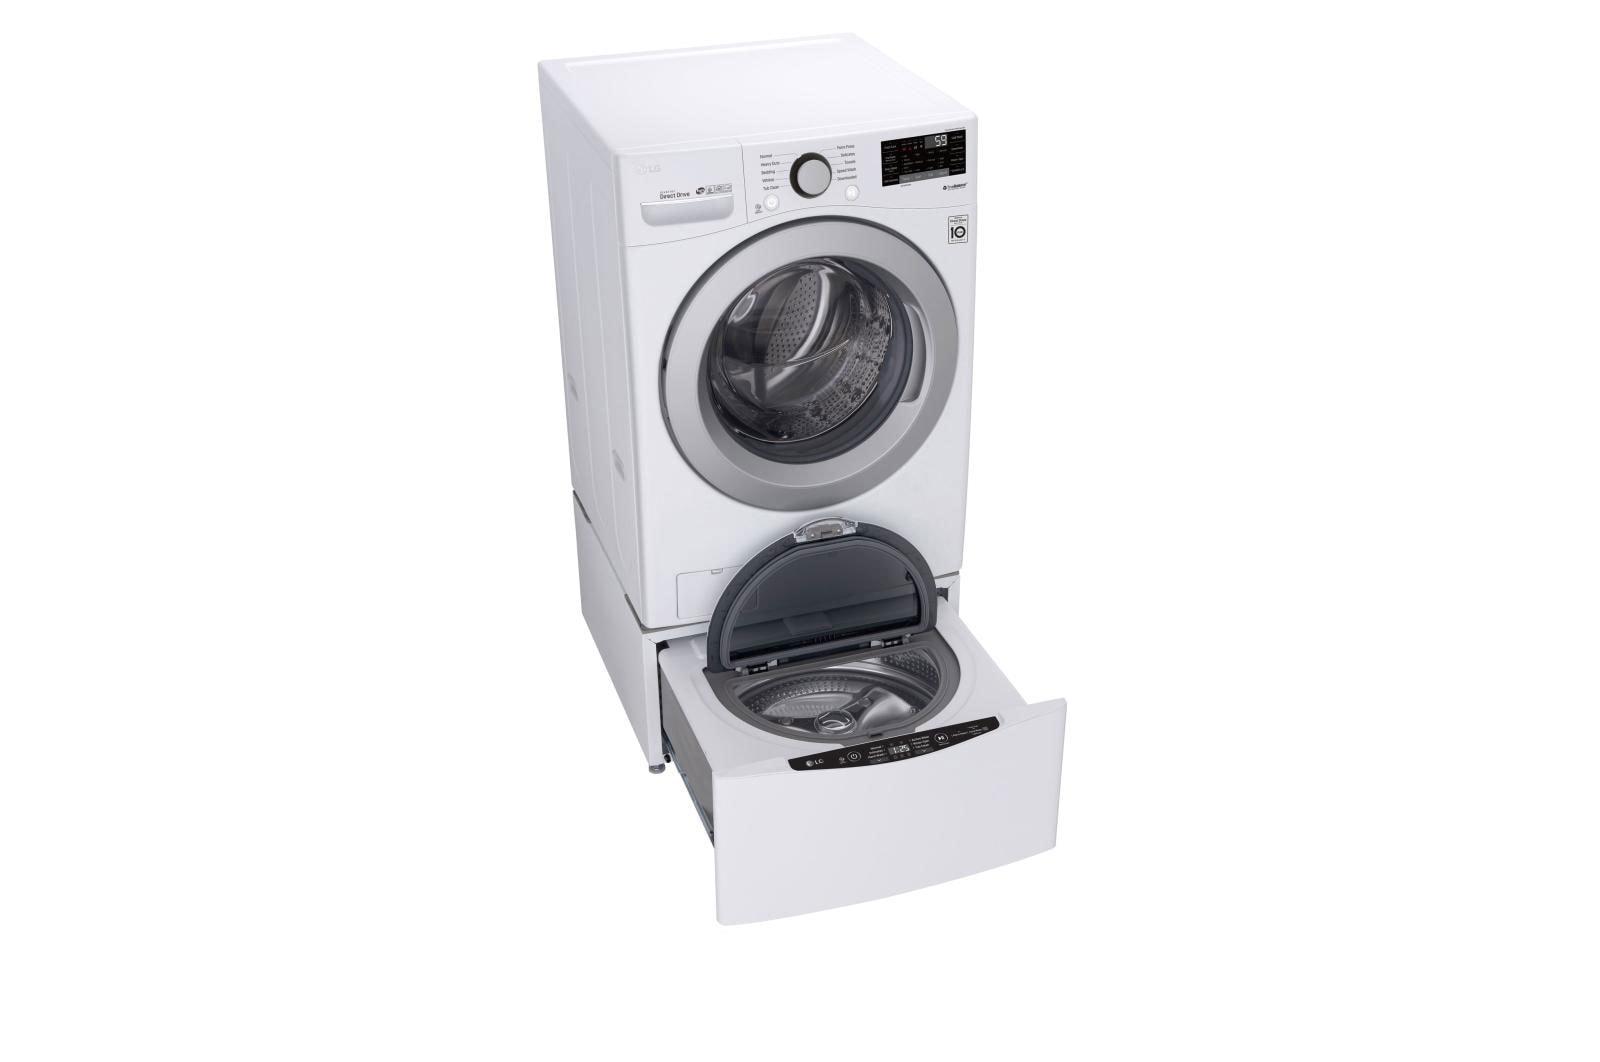 Lavadora de ropa de 35 libras - Ultra Large - Smart wi-fi Enabled Front Load Washer